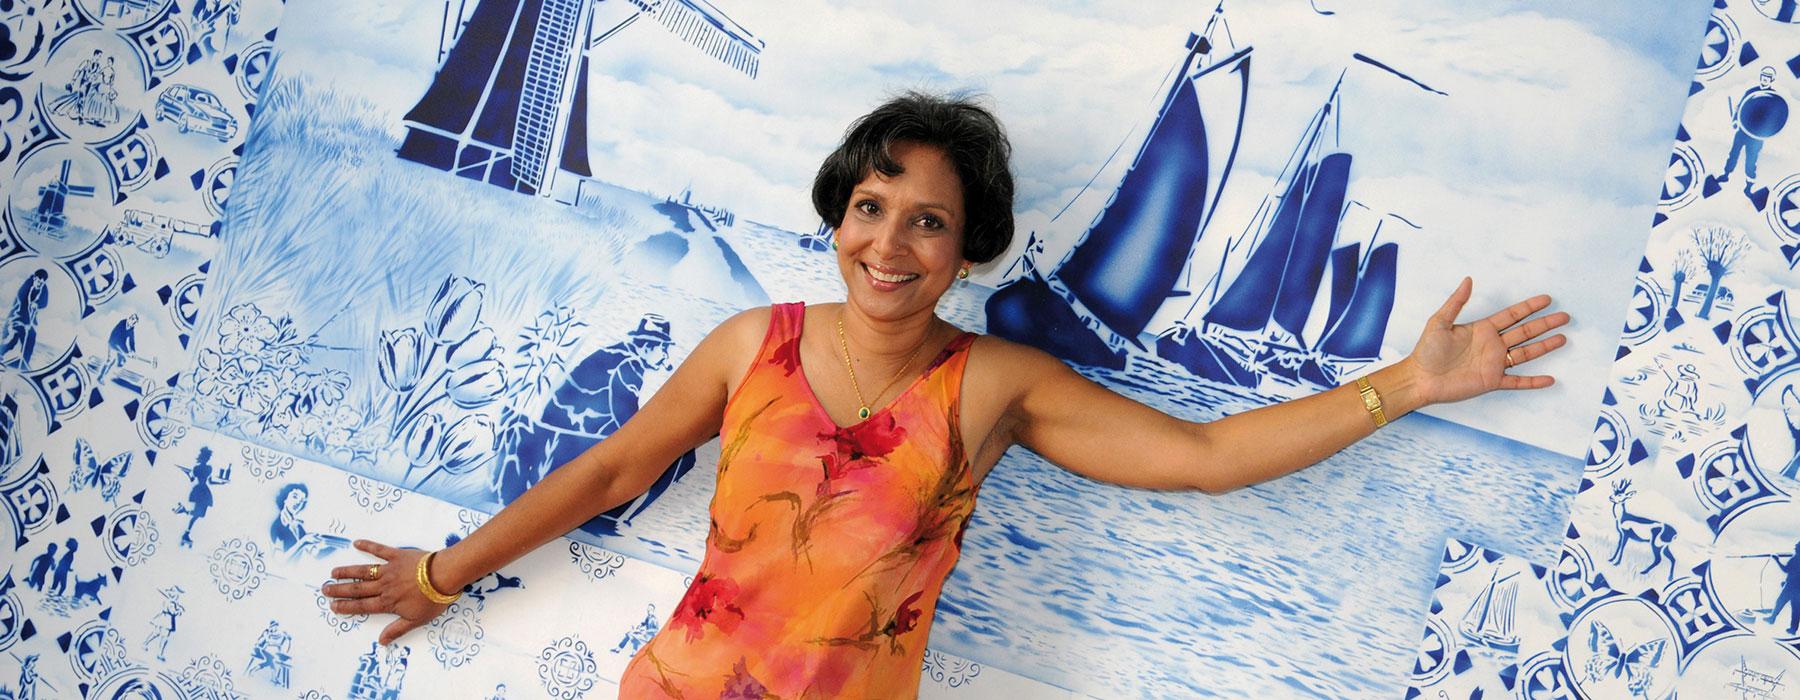 Suriname Carmelita Bodha, boek Tutti frutti, het succes van kleurrijk en ondernemend Nederland